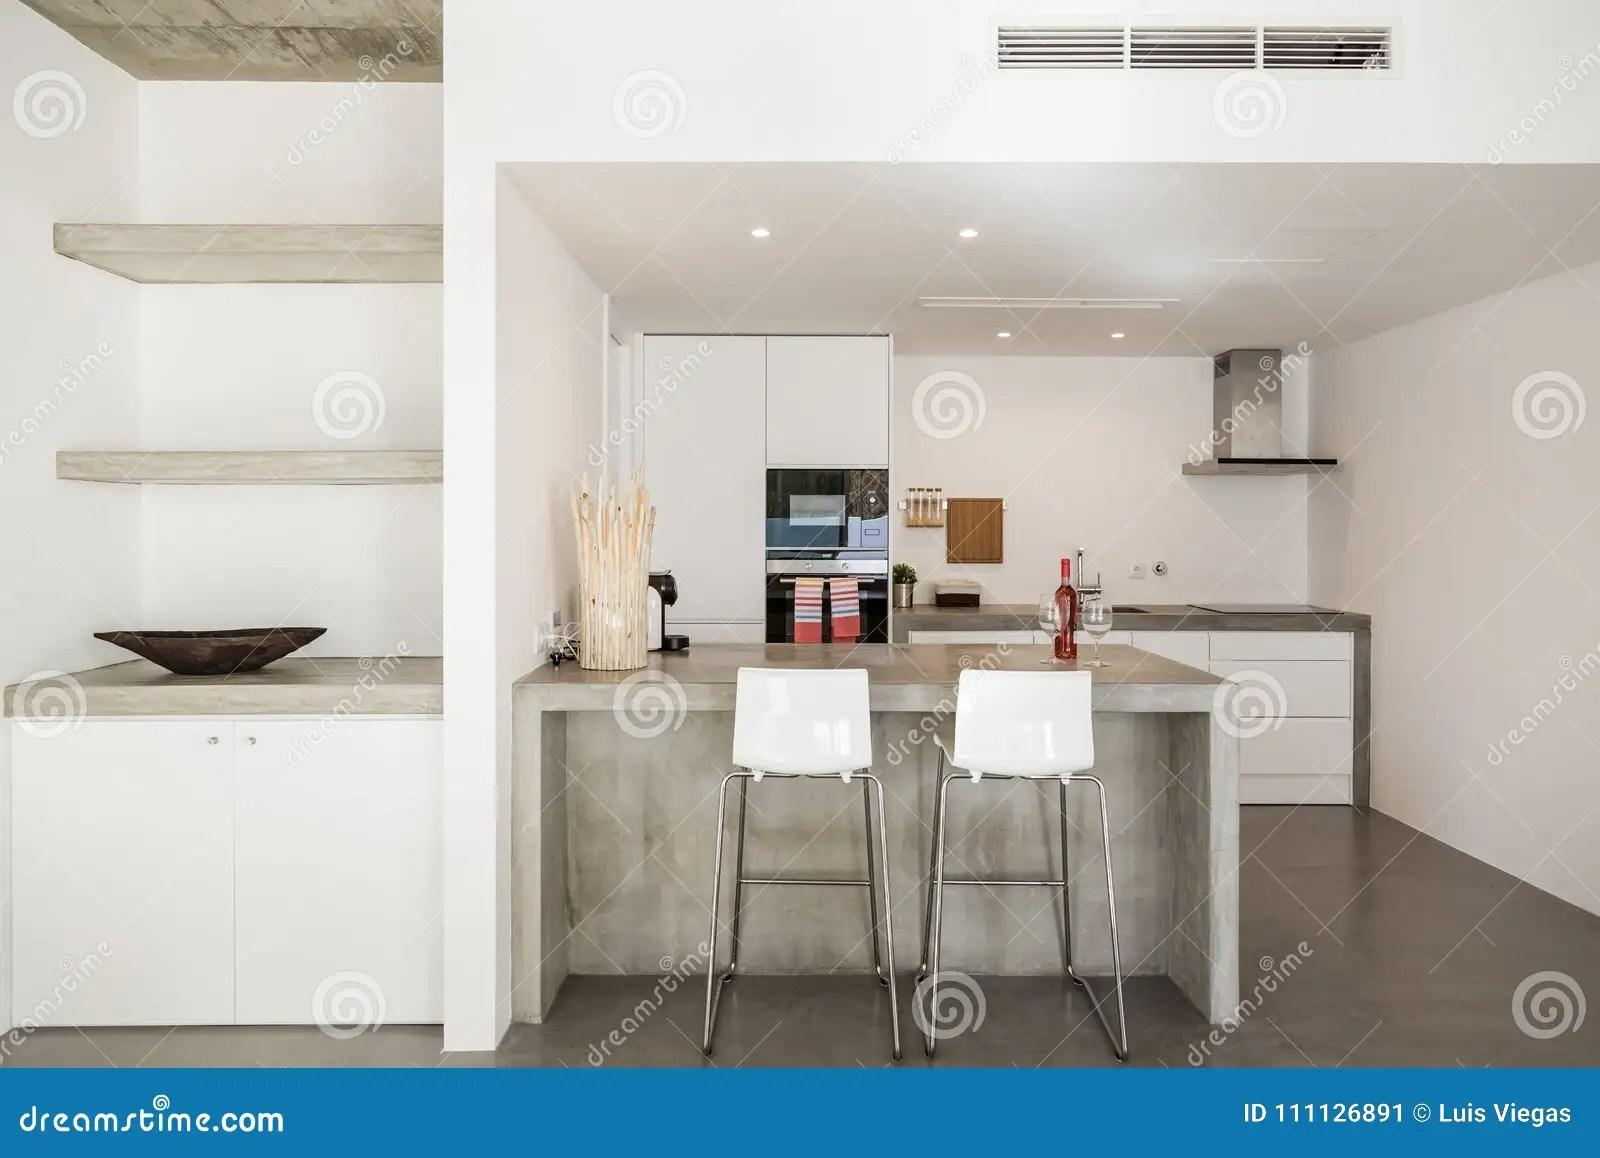 Piastrelle Cucina Bianche E Grigie | Cucina Bianca Grigia